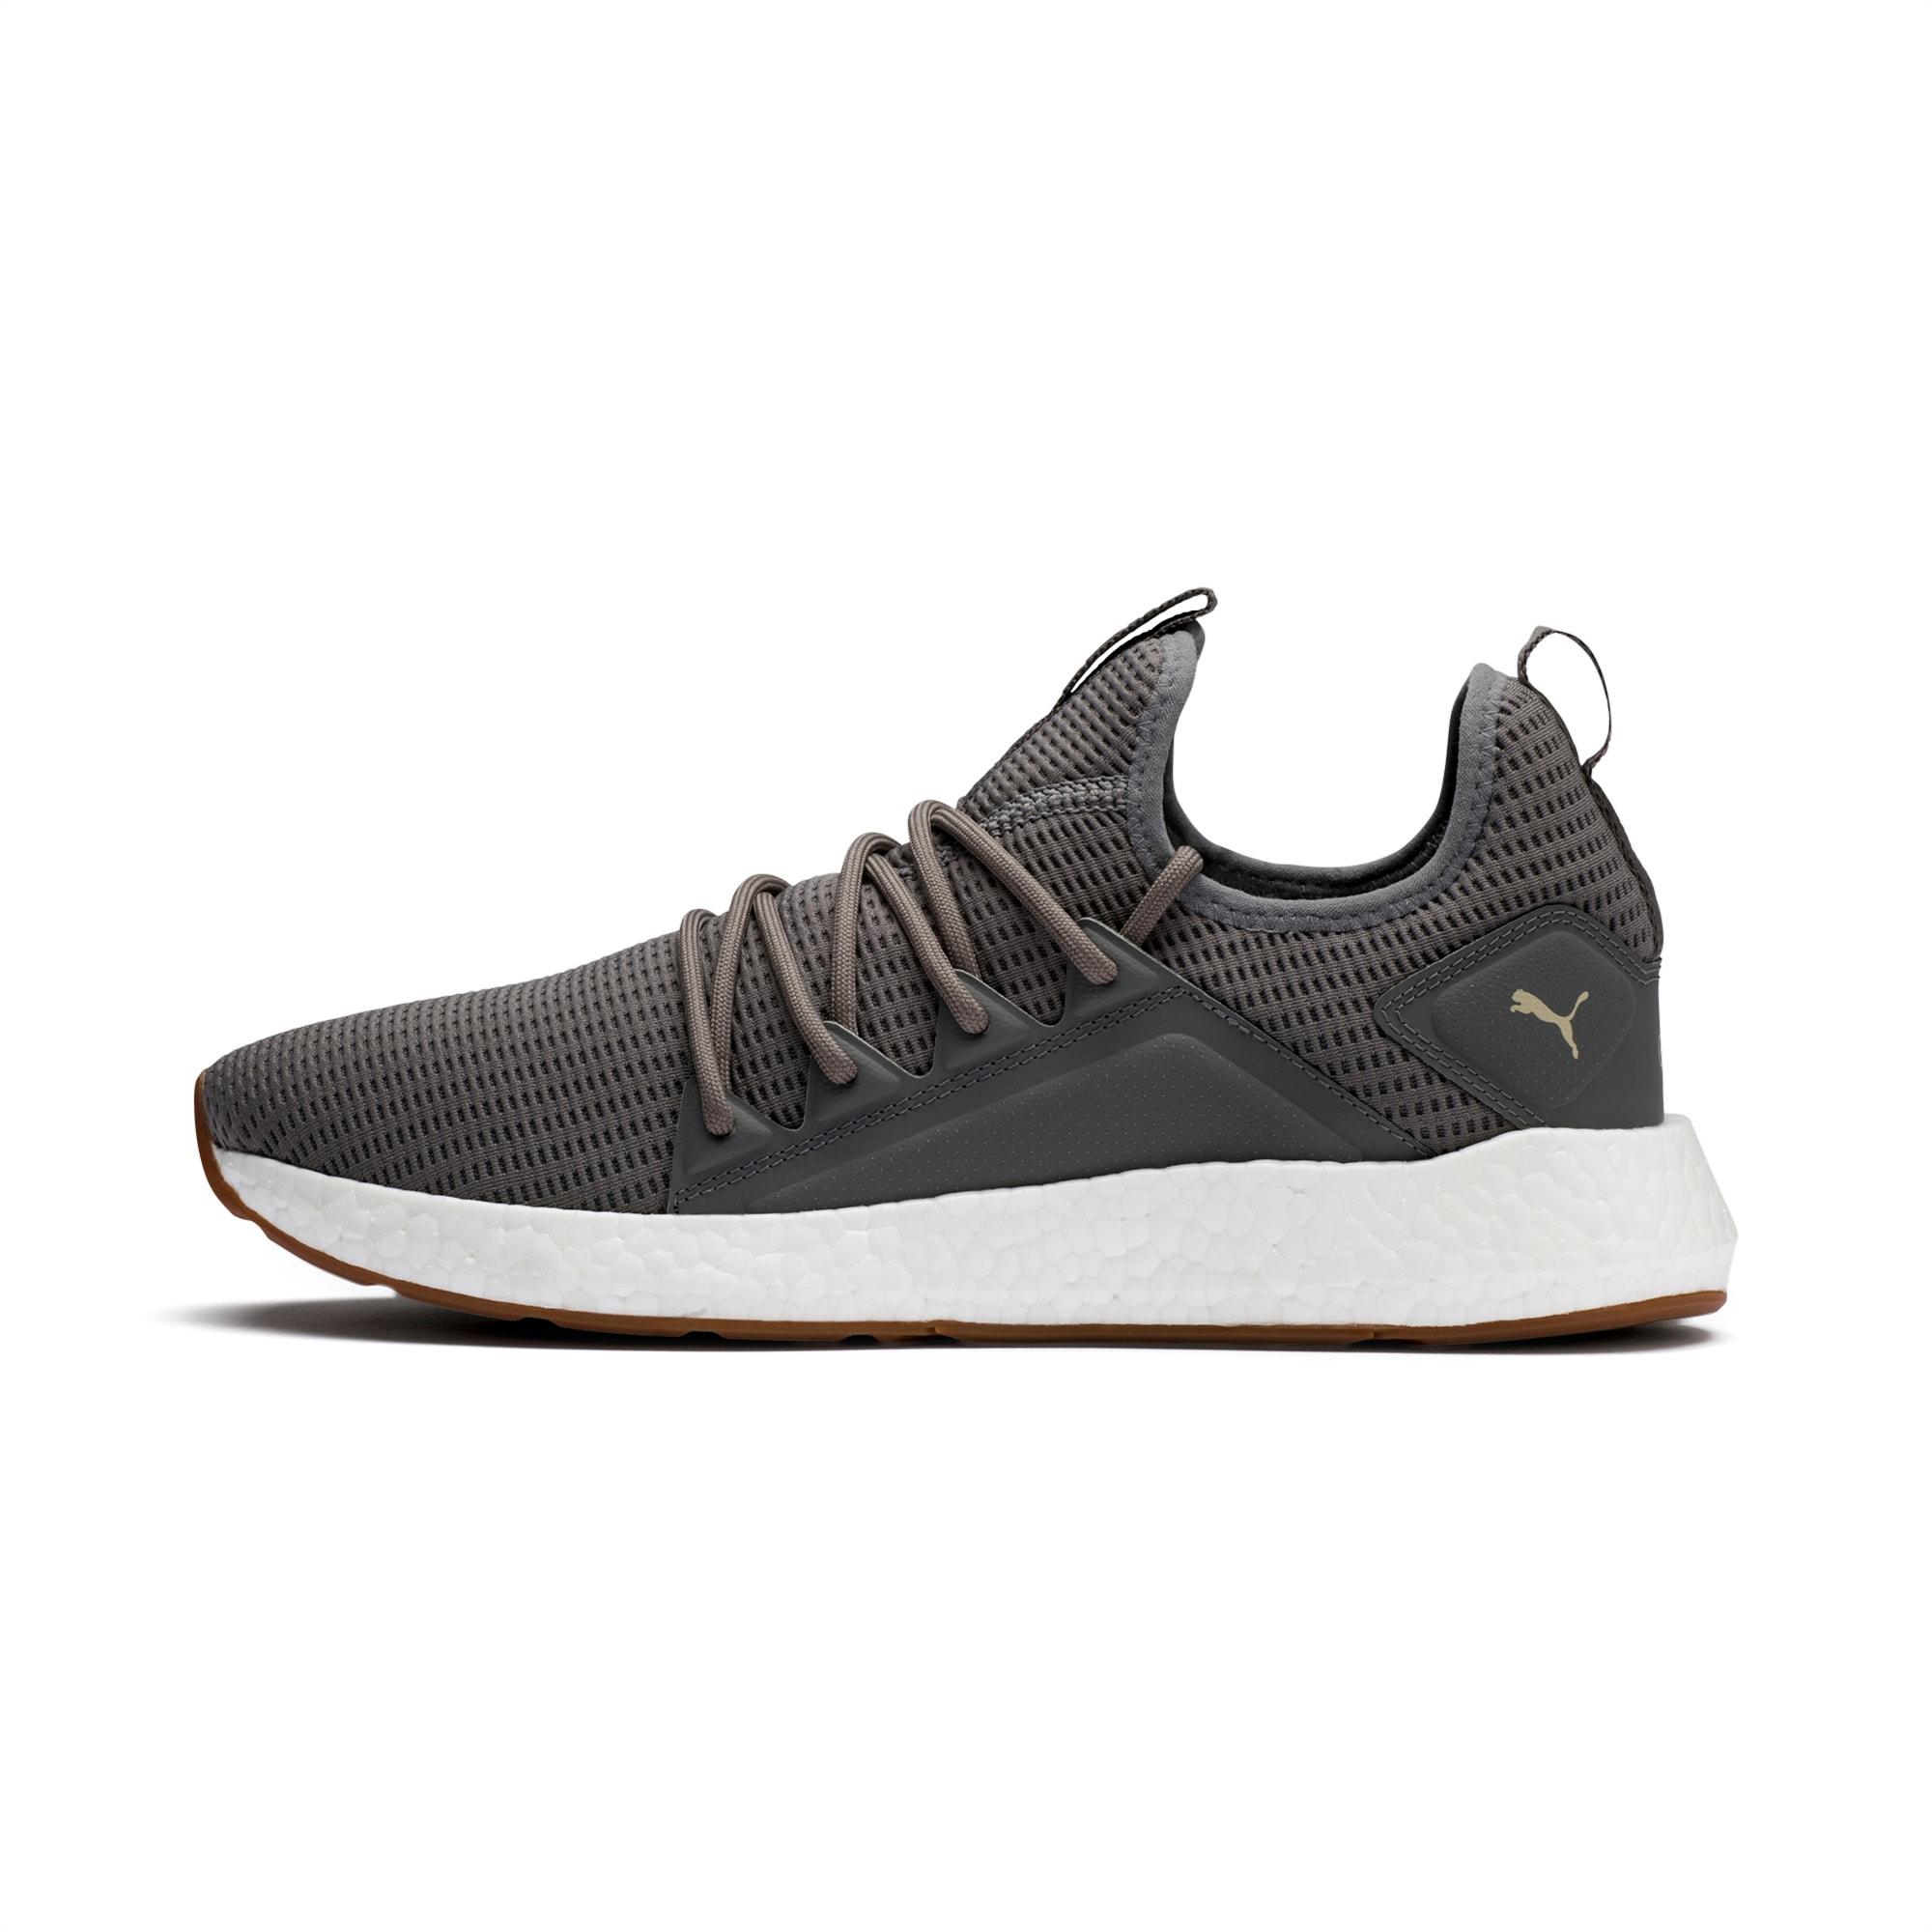 NRGY Neko Future Men's Running Shoes